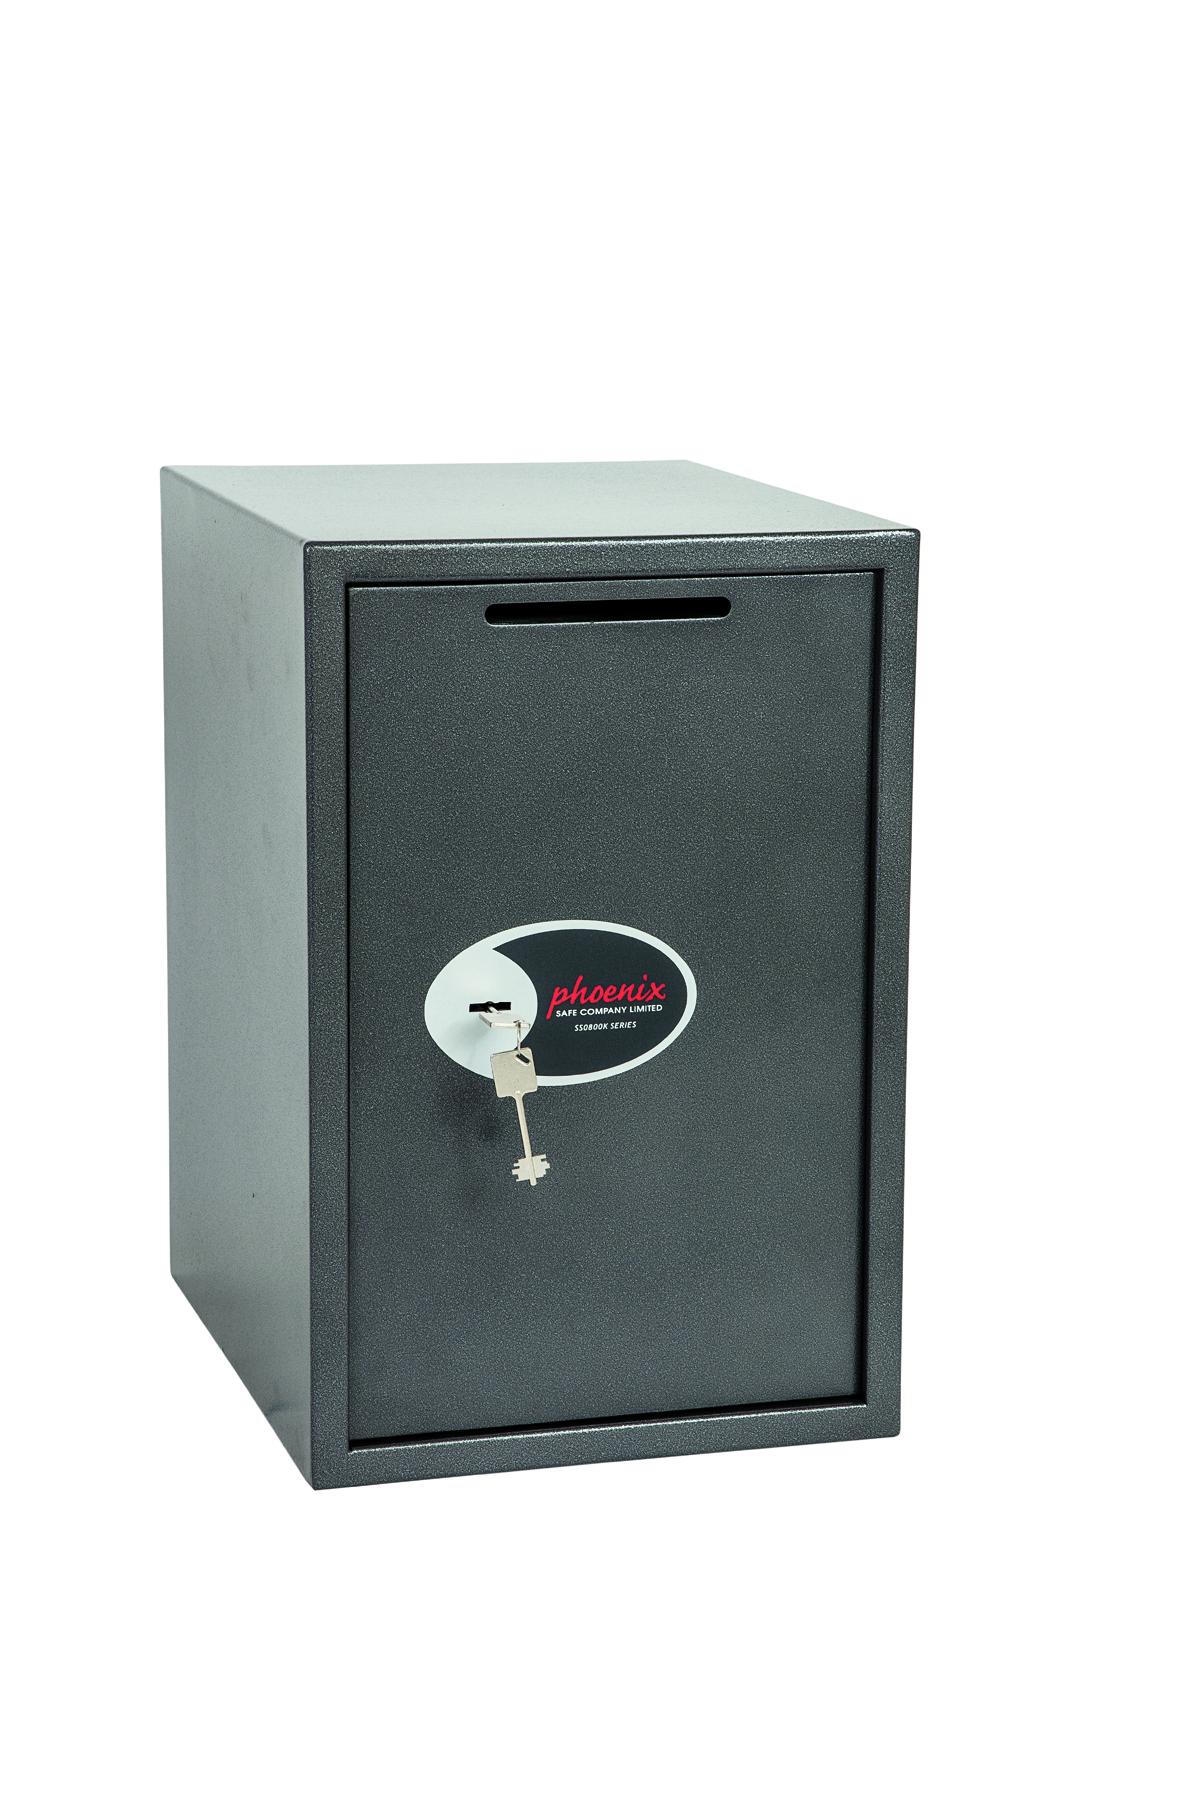 Key Store Phoenix Vela Deposit Home & Office Size 5 Safe Key Lock